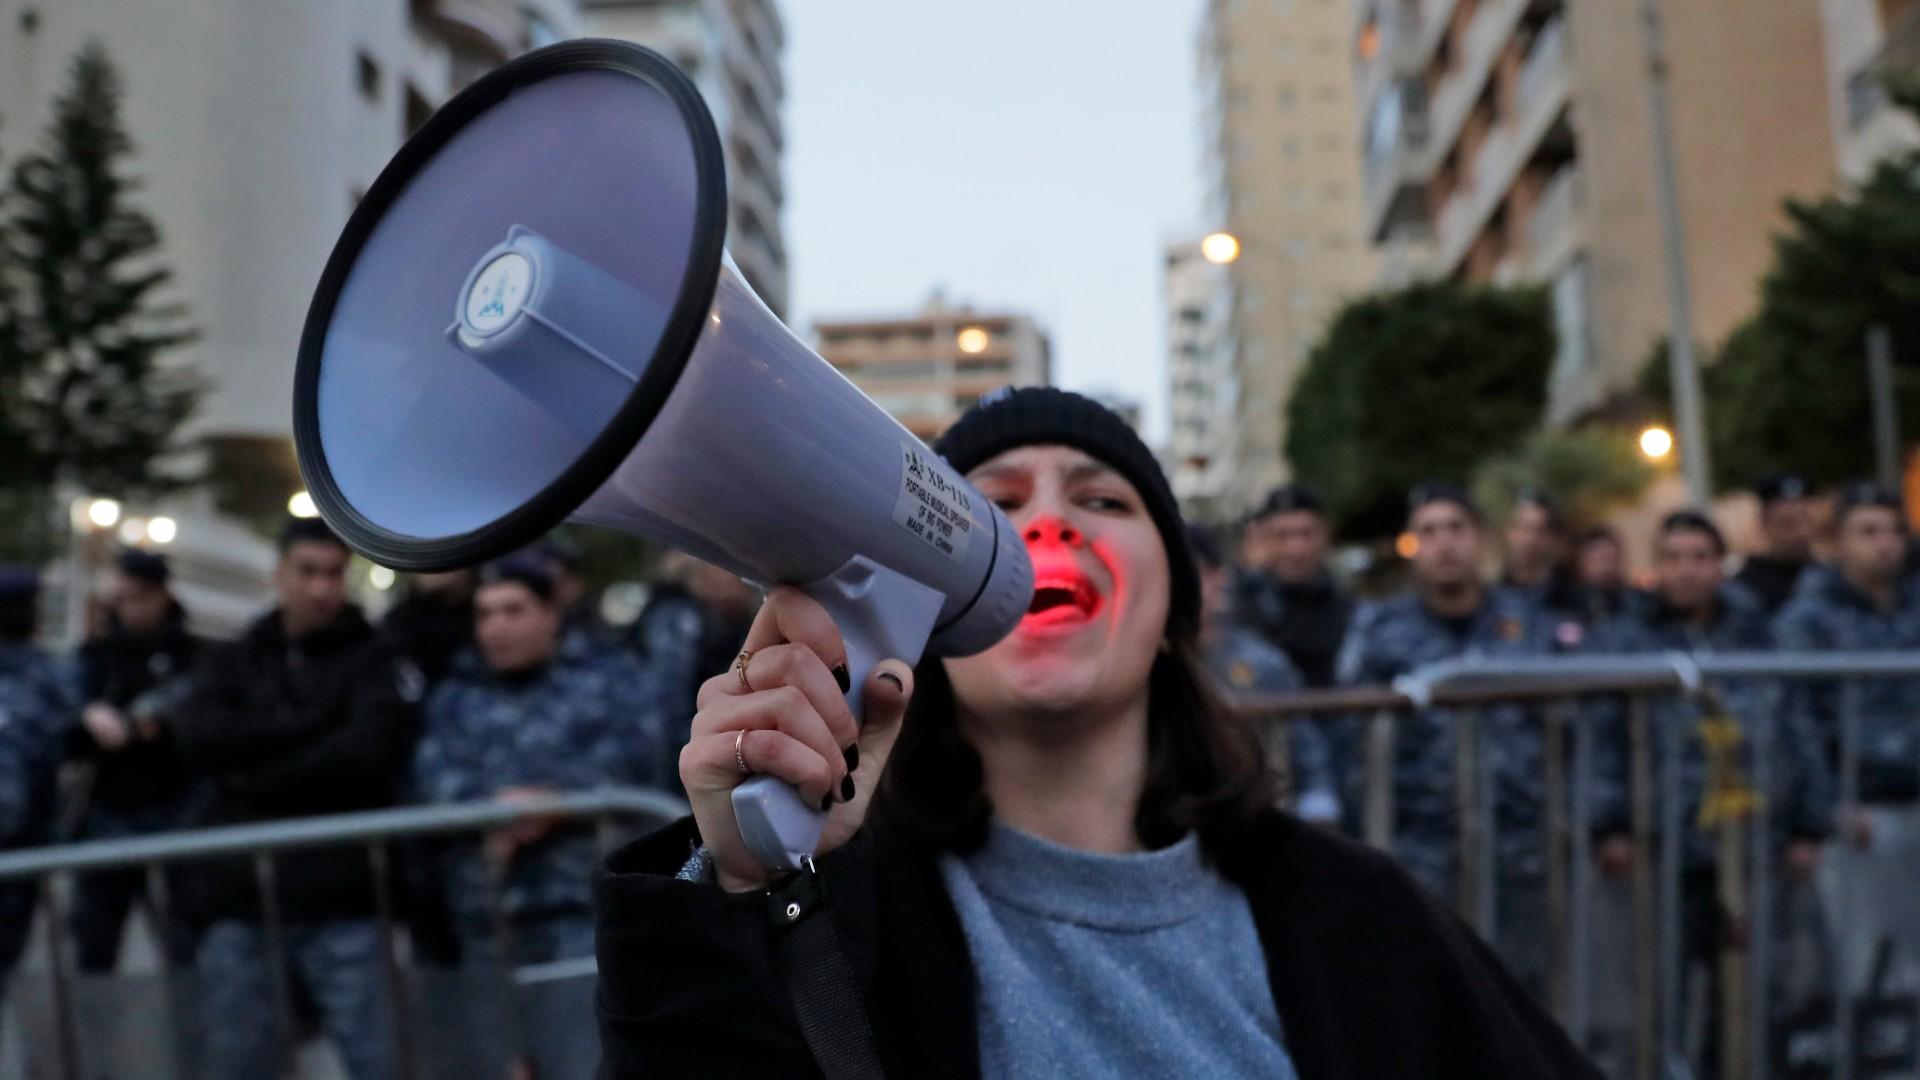 Lebanon Unrest Protest Tactics Include Public Shaming Lebanon News Al Jazeera